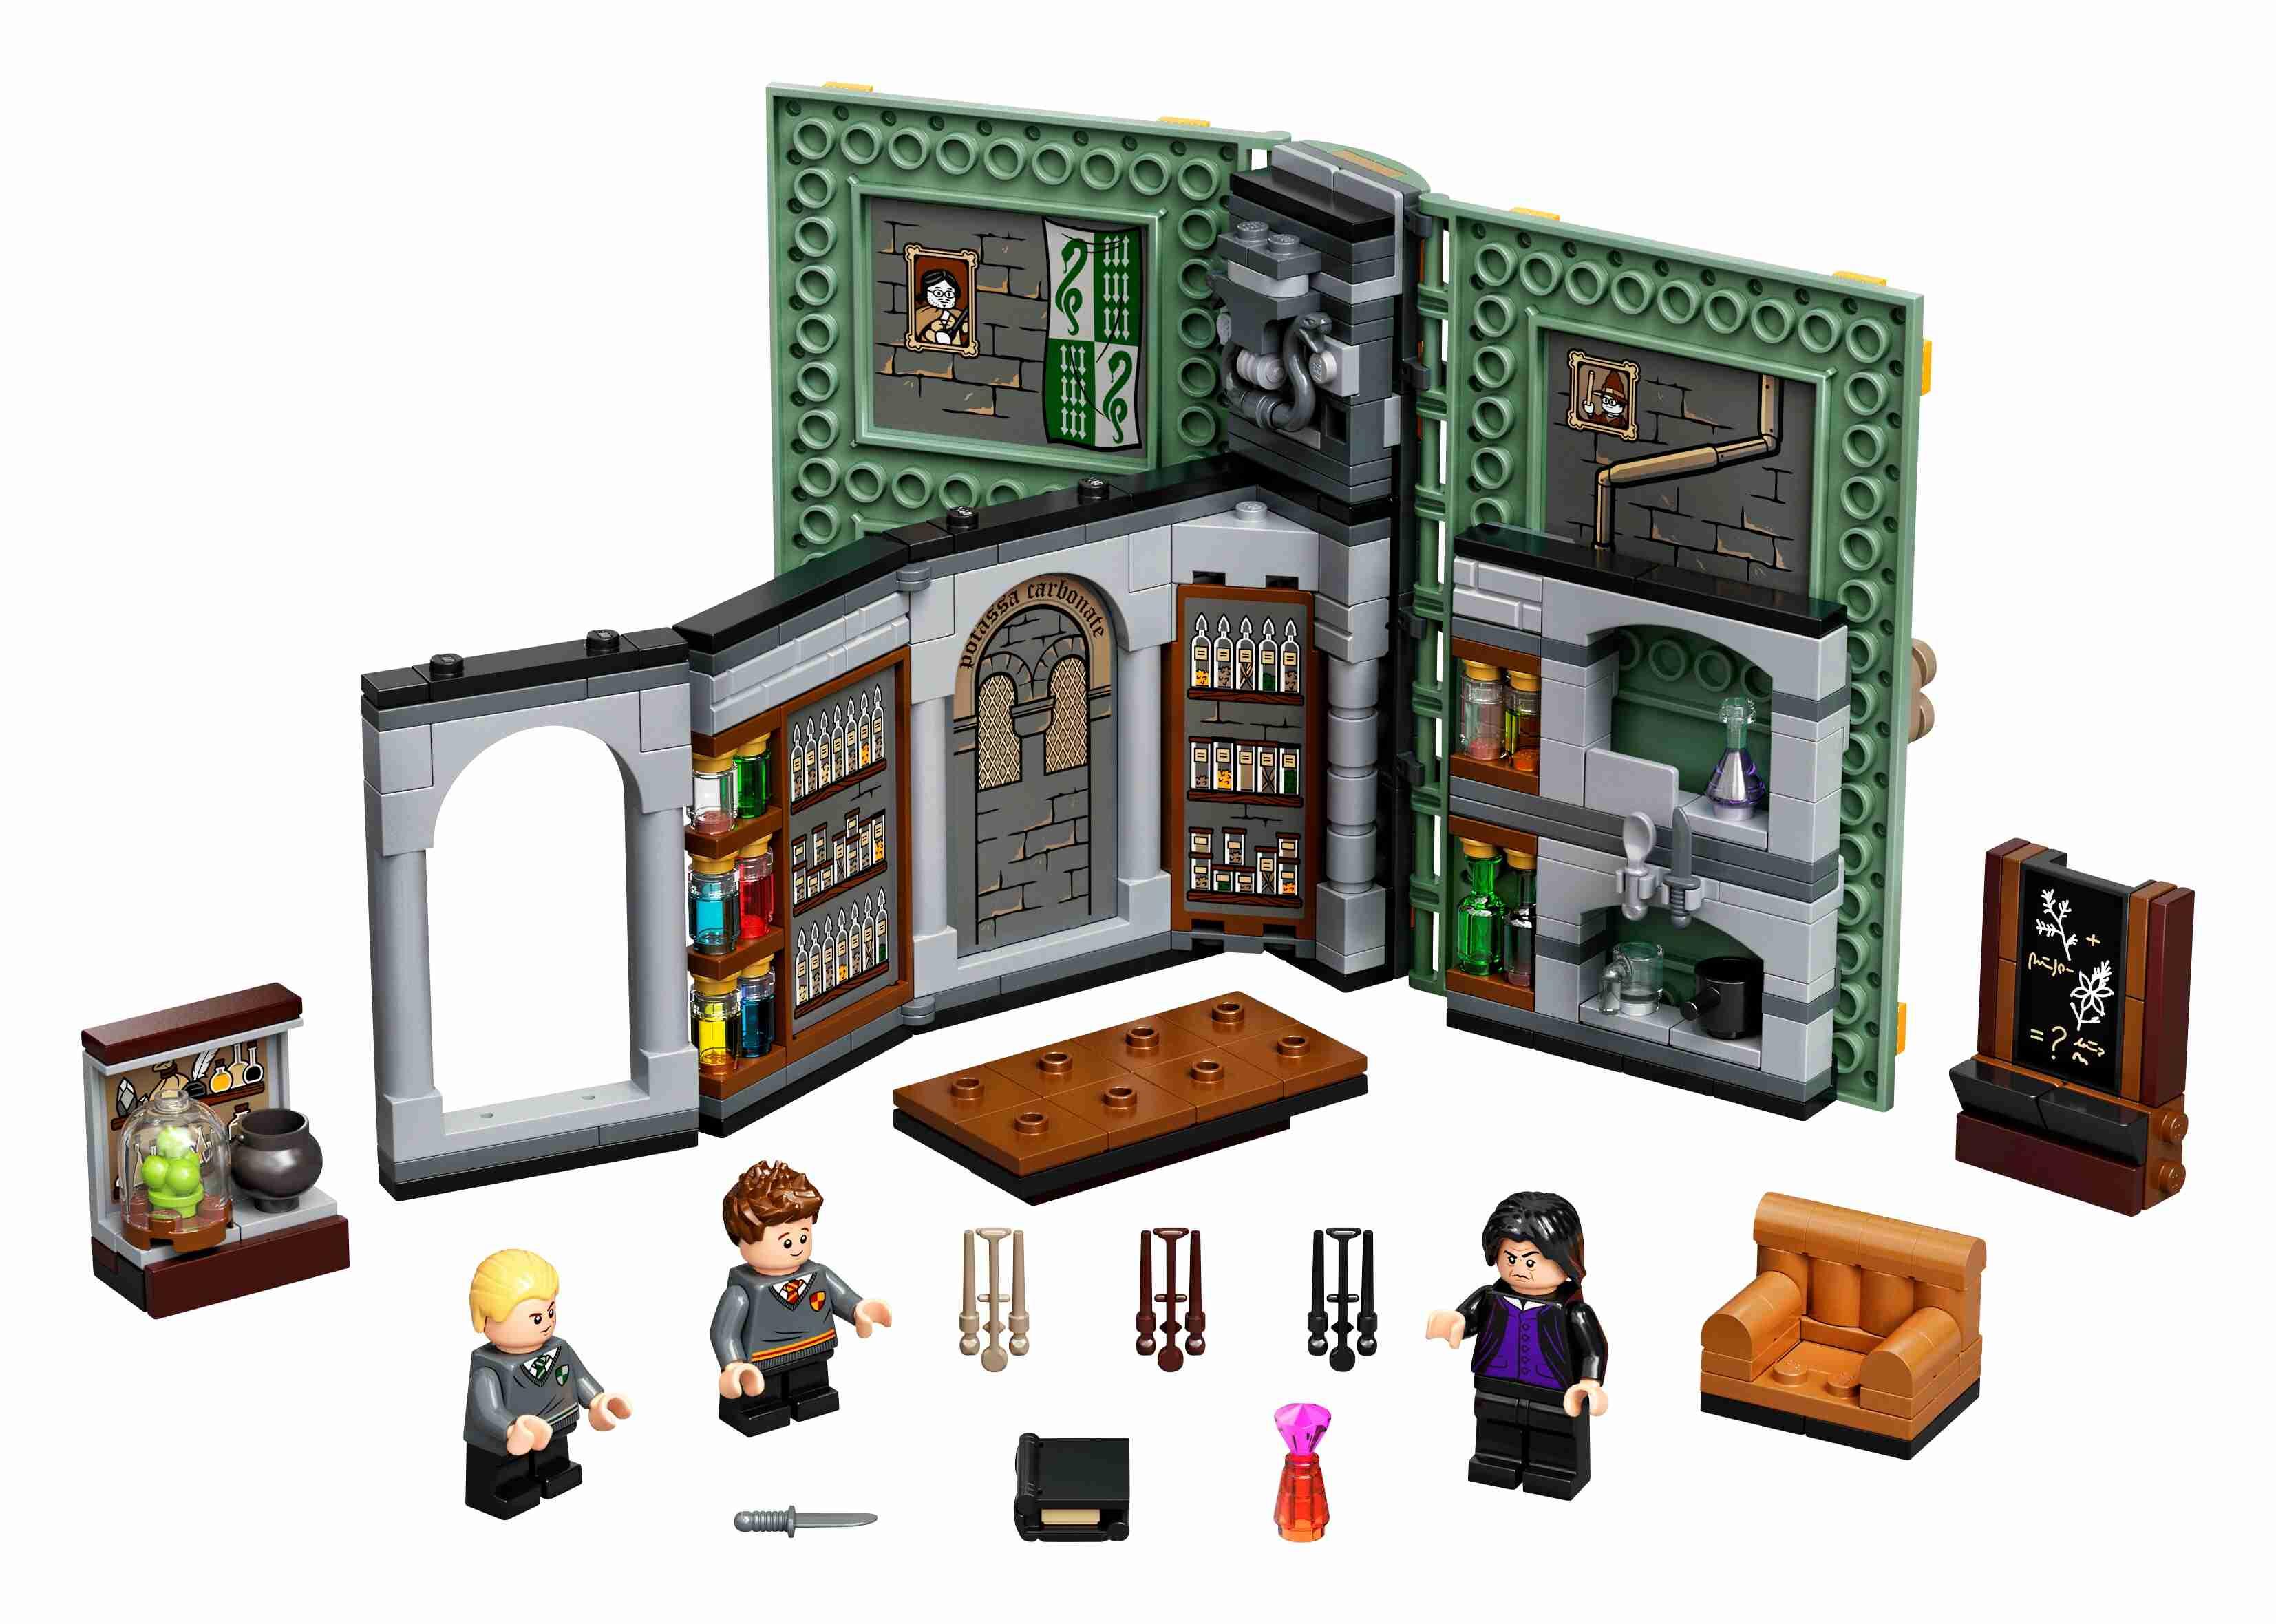 LEGO76383HarryPotterHogwartsMoment:Zaubertrankunterricht